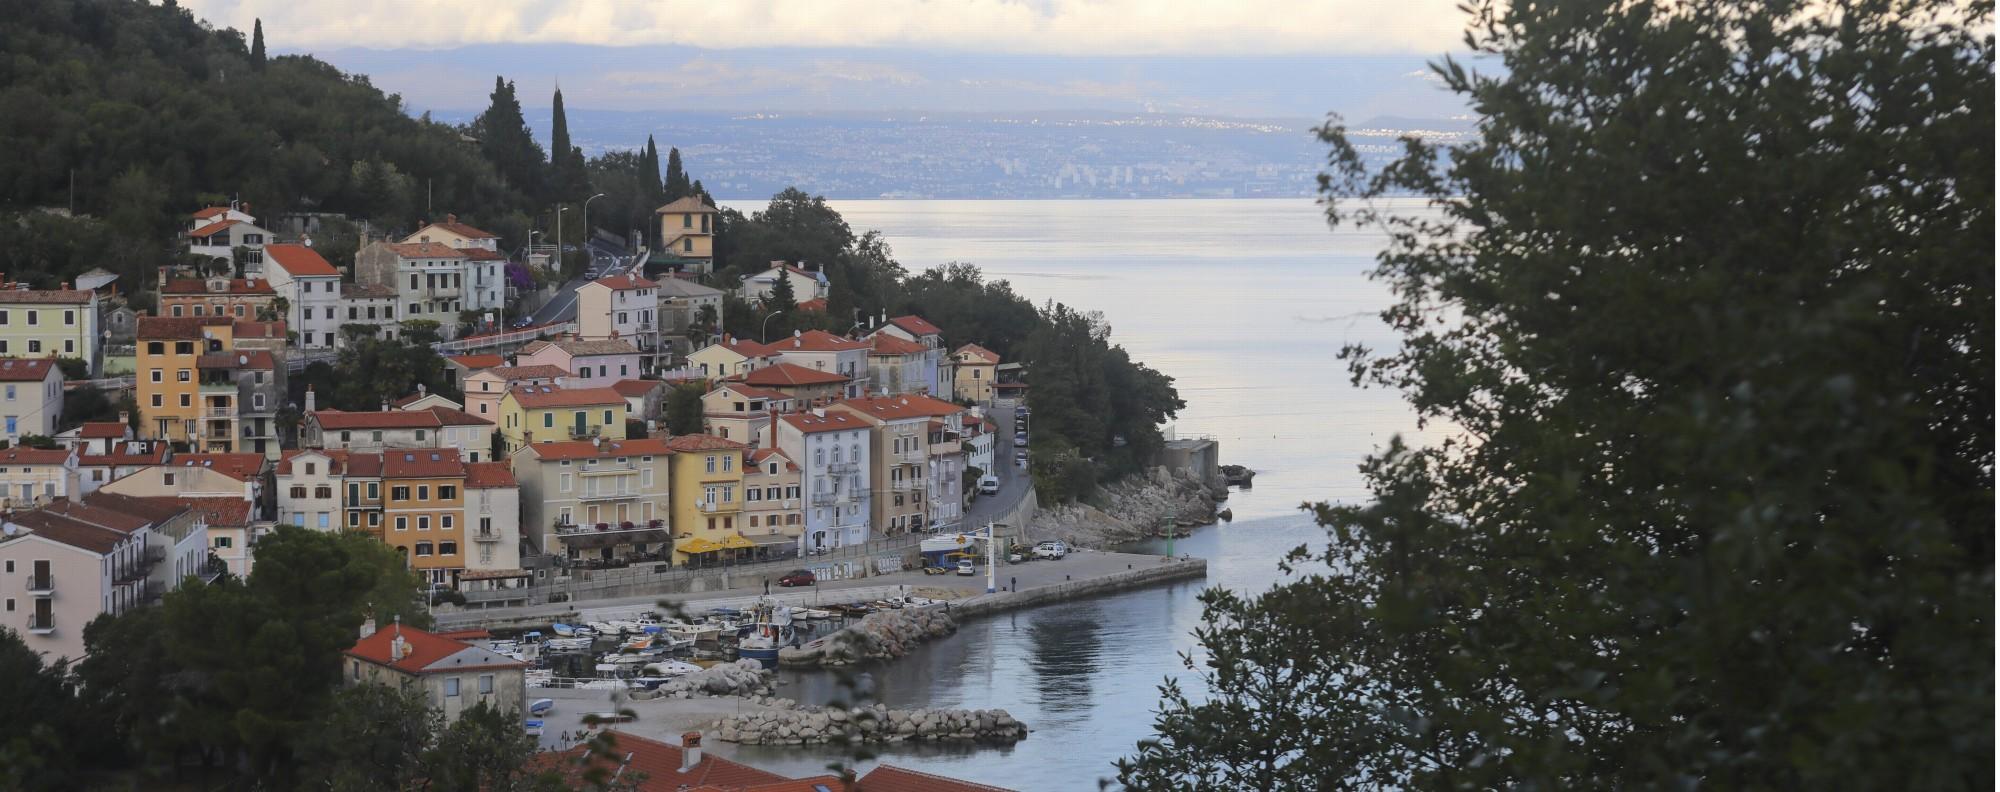 A harbour near Opatija, Croatia.